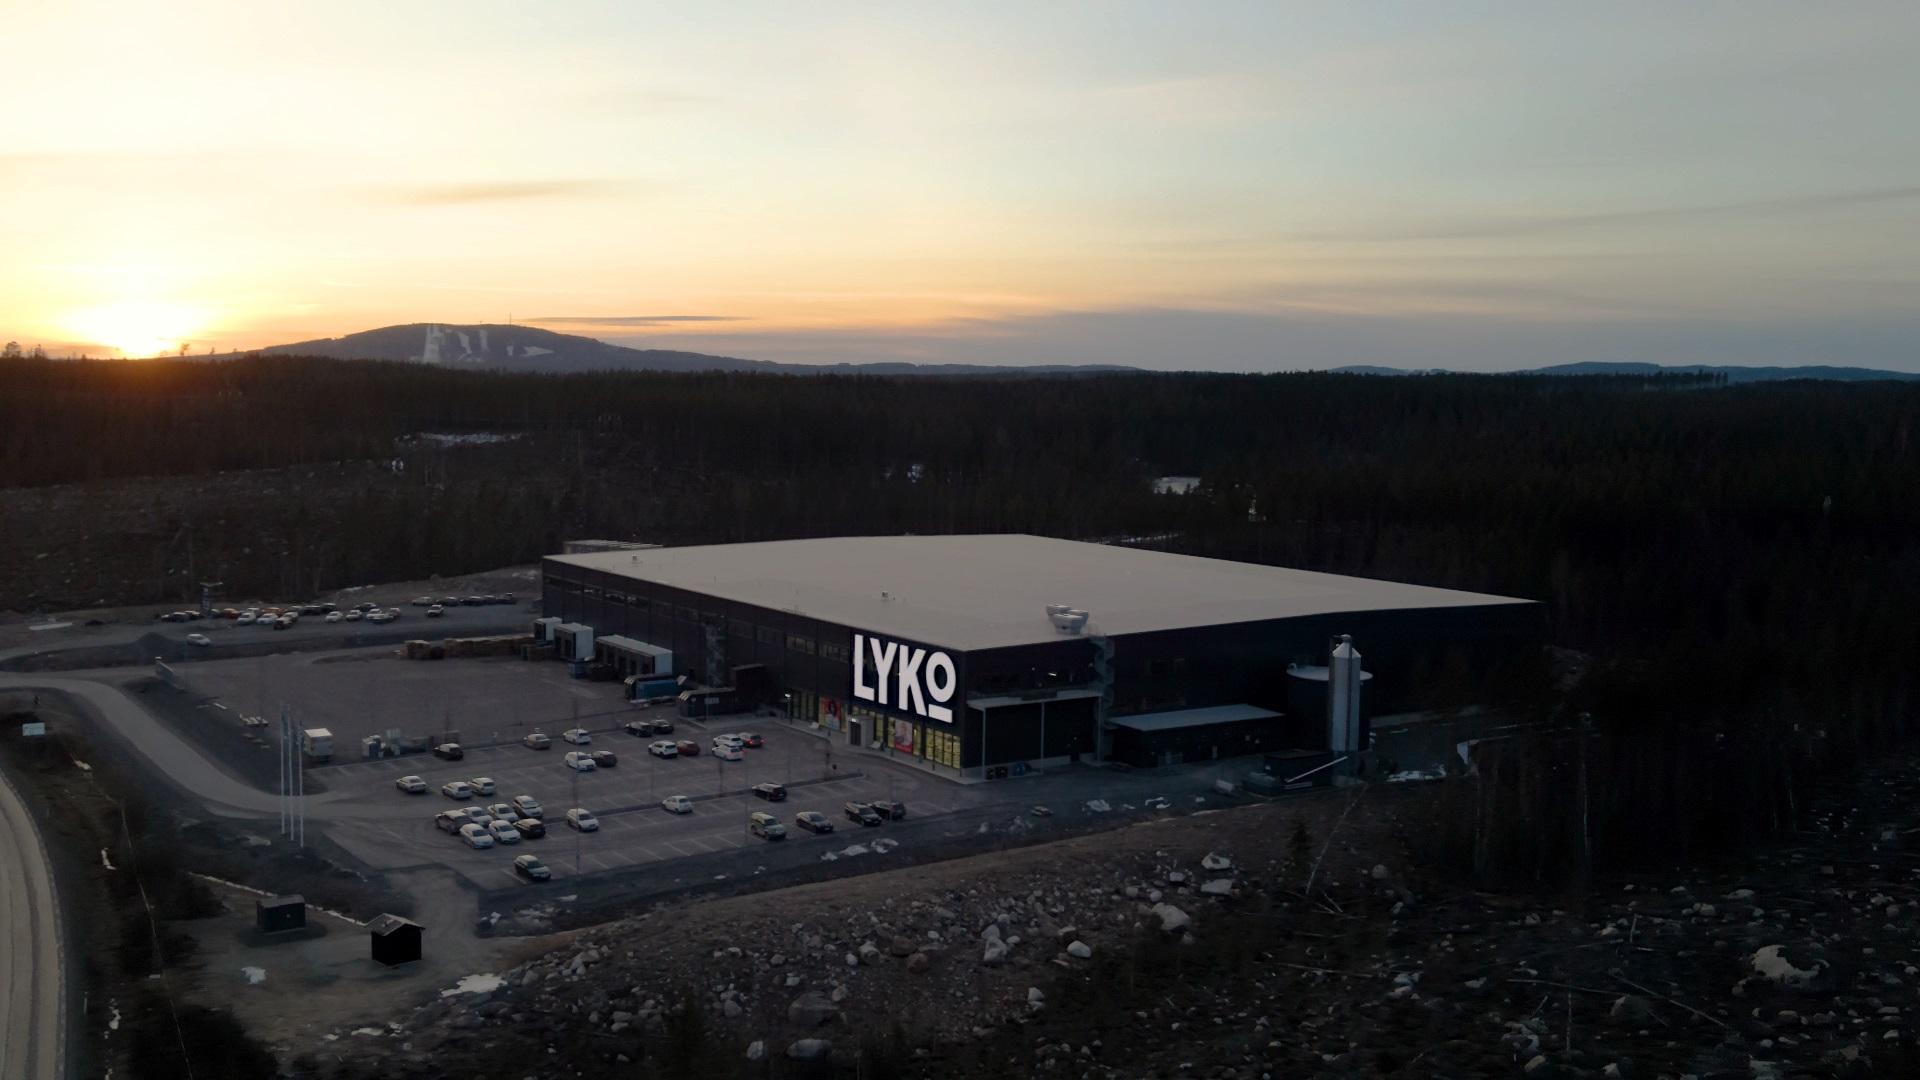 Lyko lagerlokal drönarbild i solnedgång